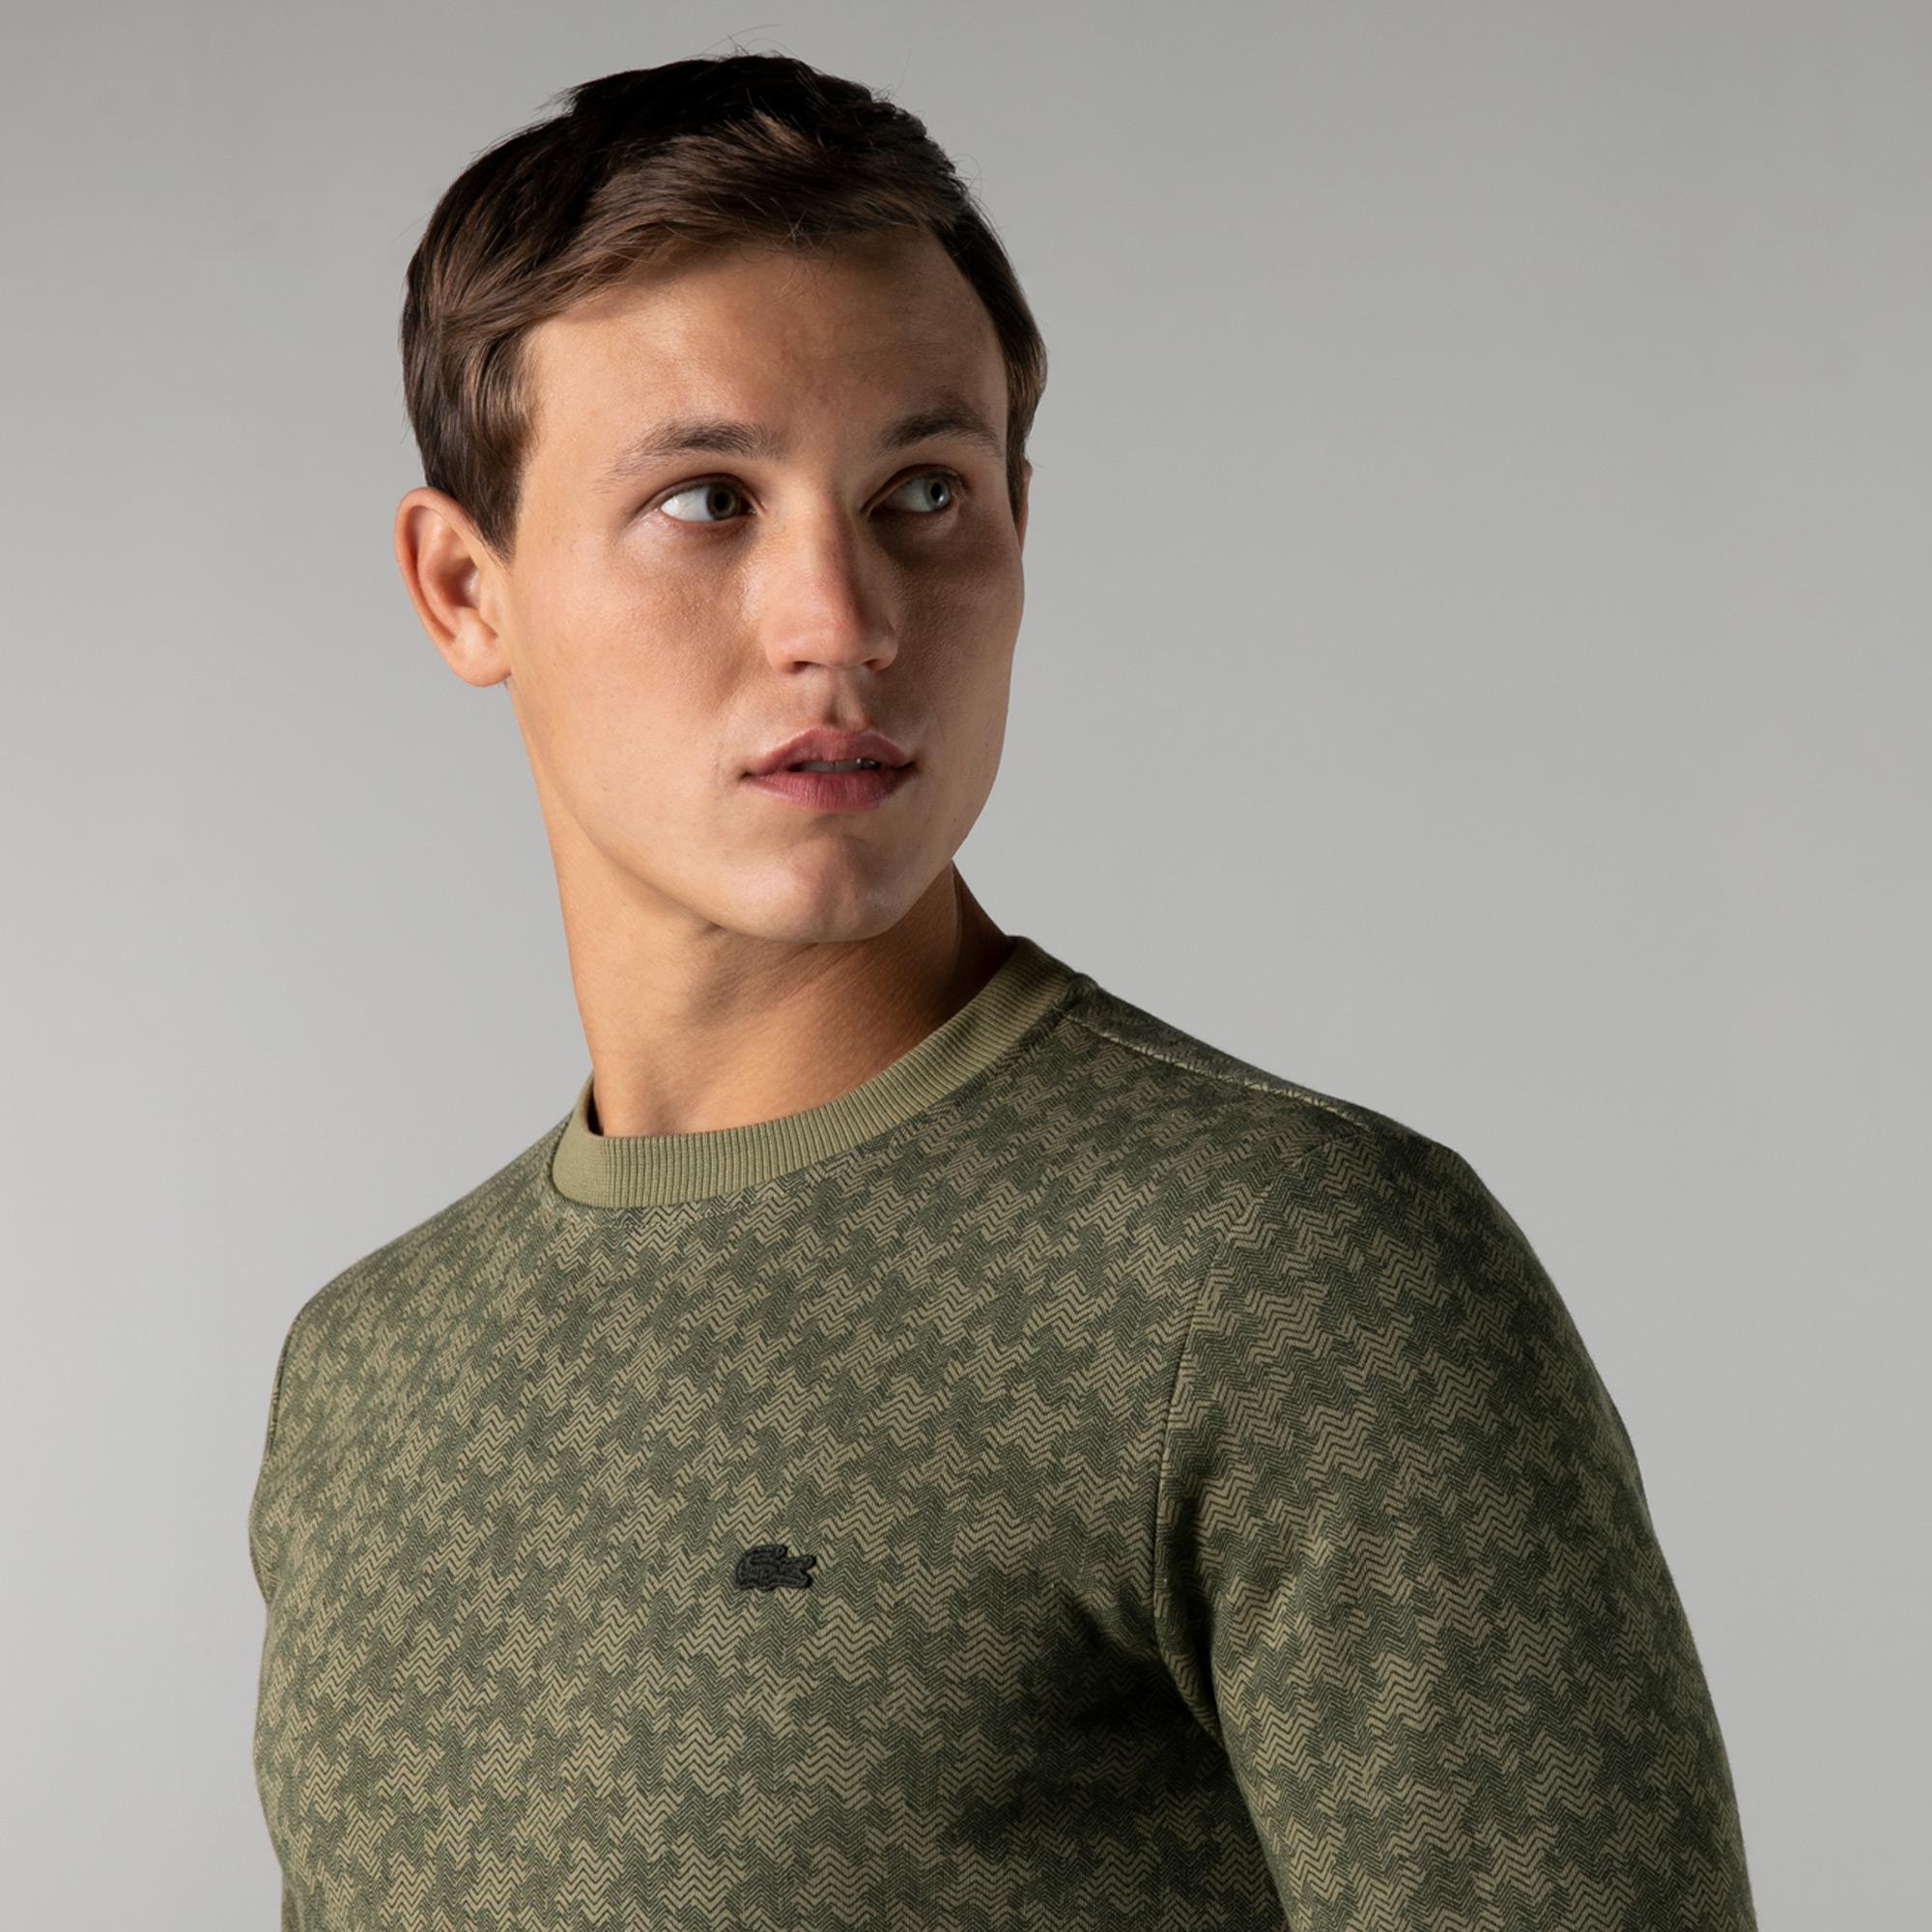 Lacoste Erkek Slim Fit Bisiklet Yaka Desenli Haki Sweatshirt